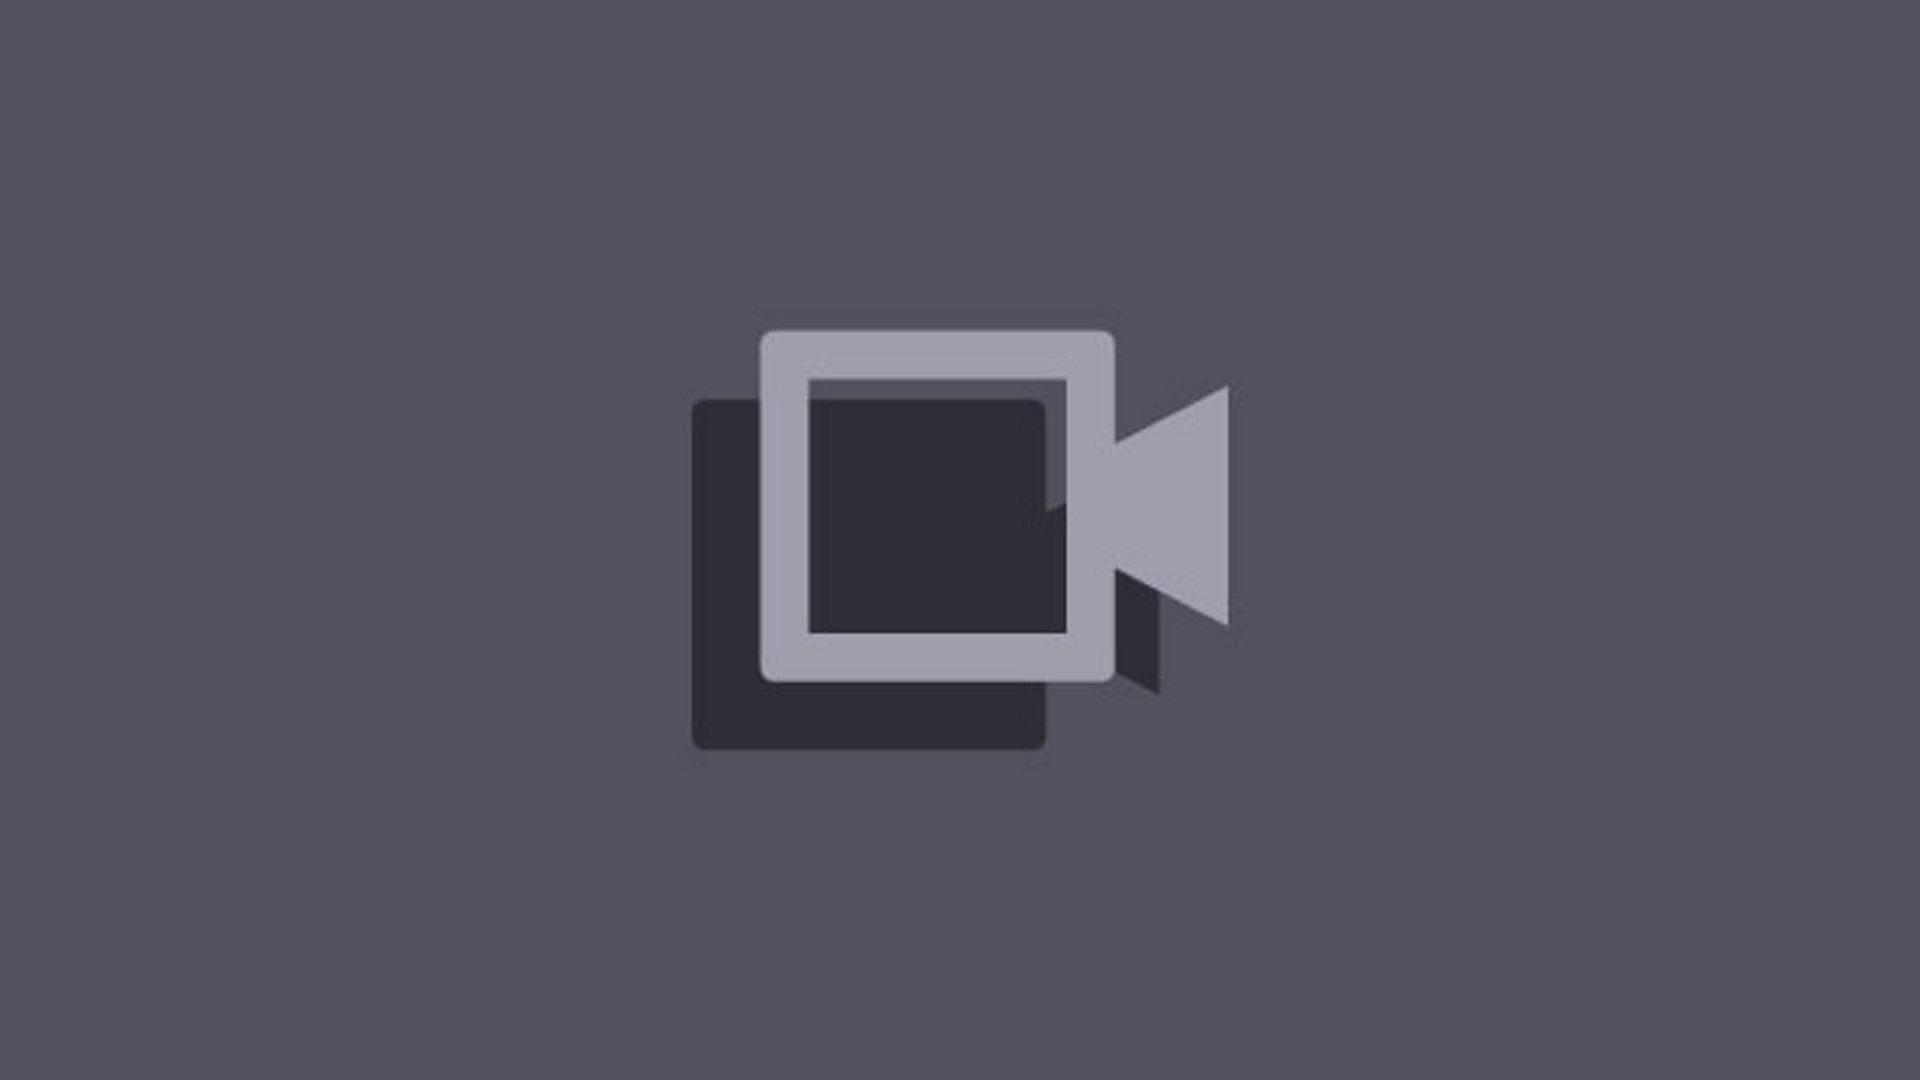 stream image